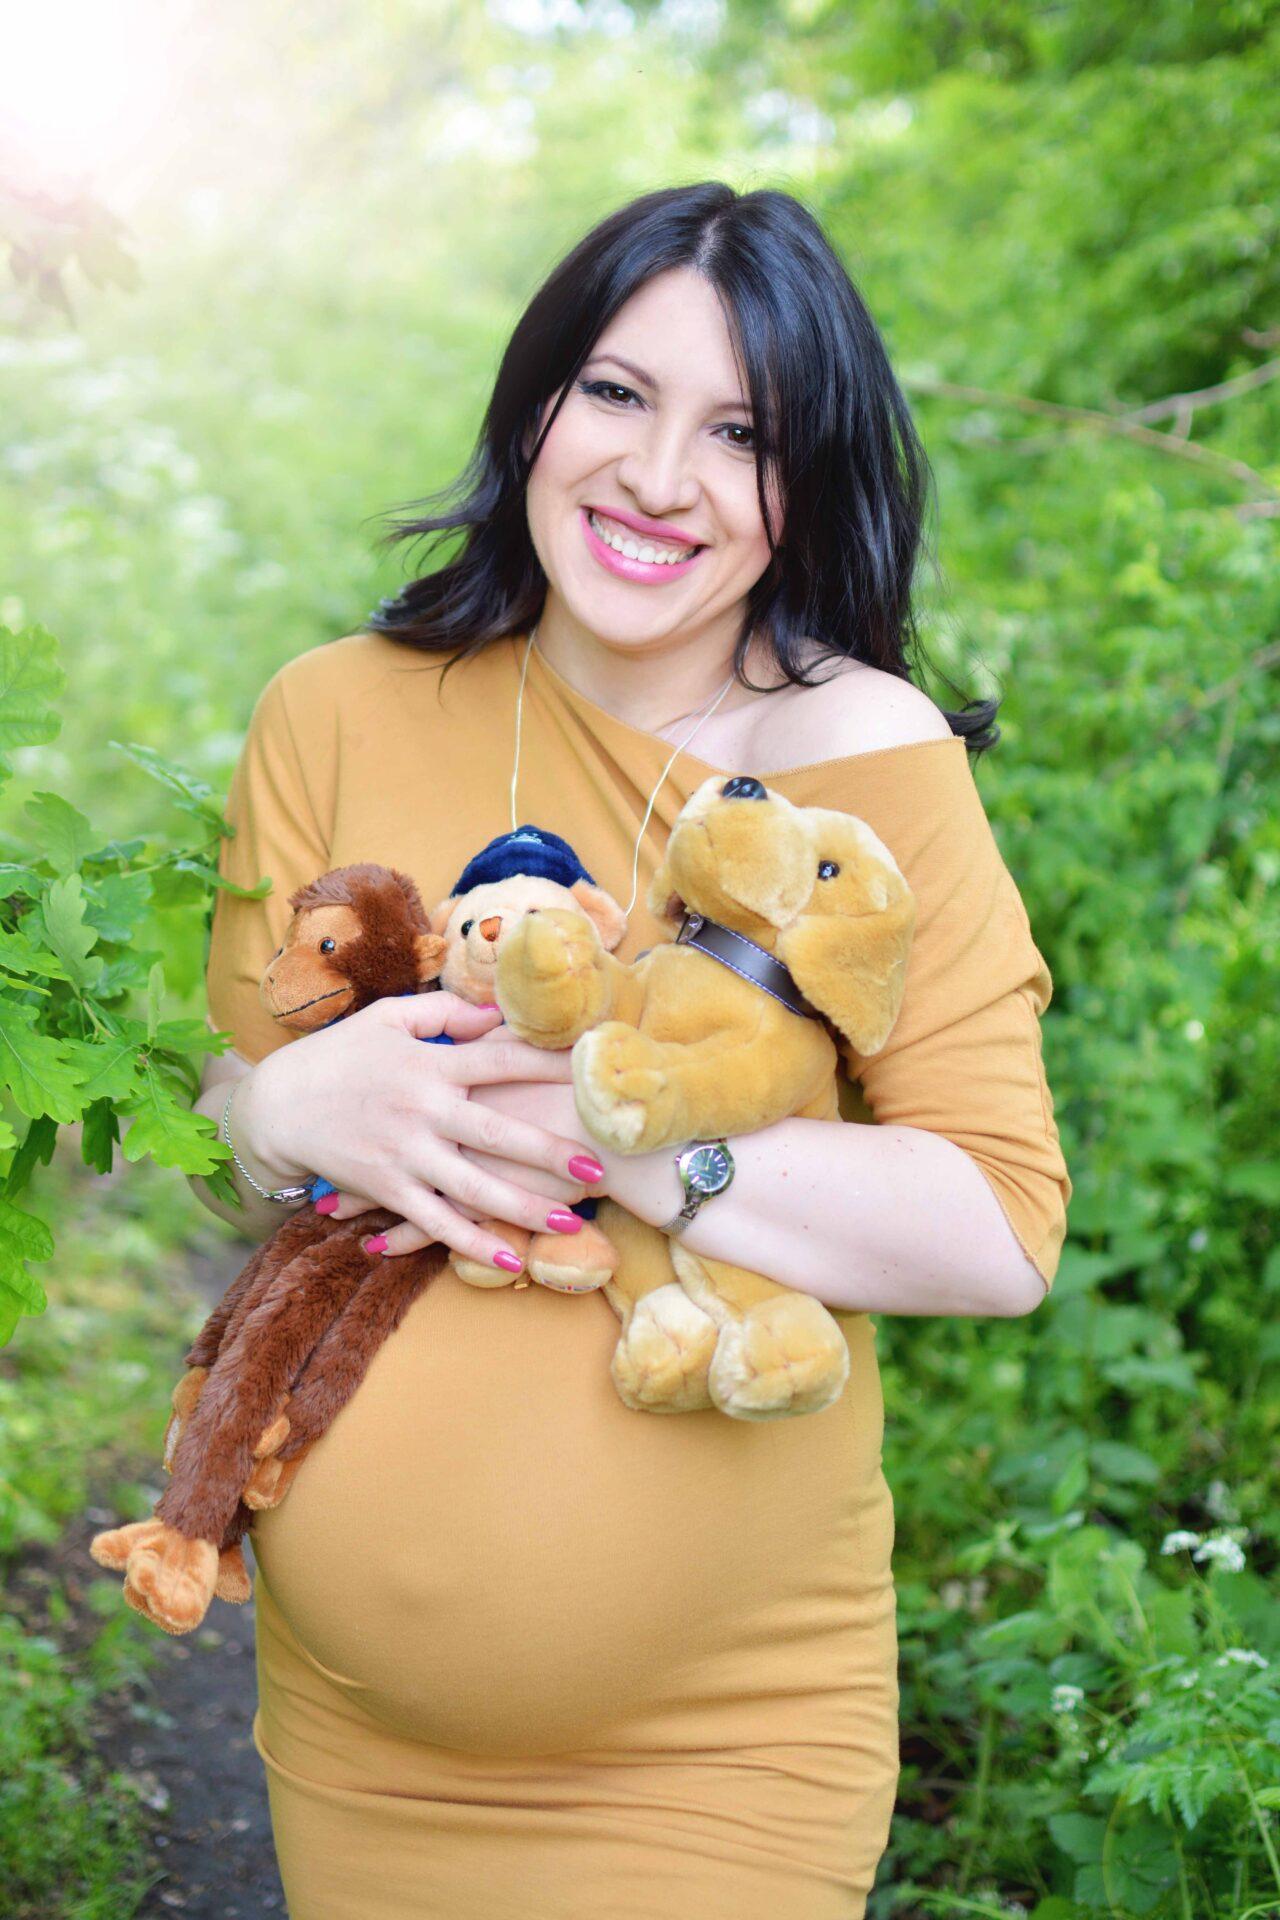 maternity-photography-at-mudchute-park-and-farm-london